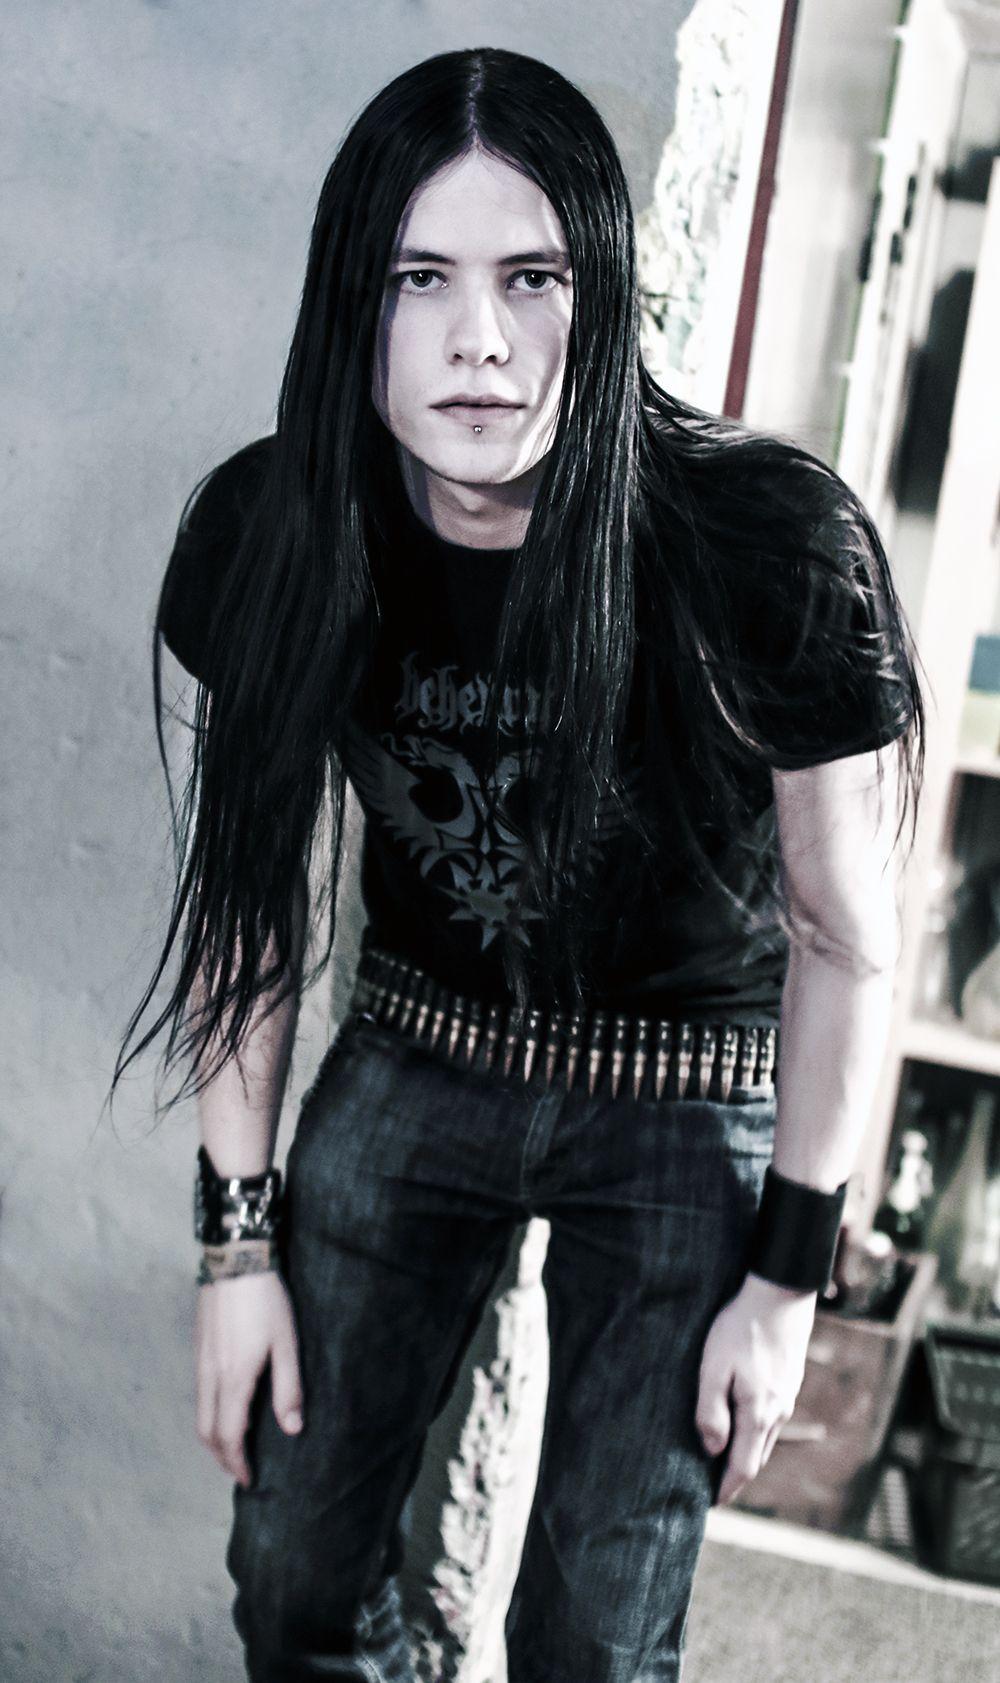 Oscar Fahl 233 N Disregard Arcosolium Long Haired